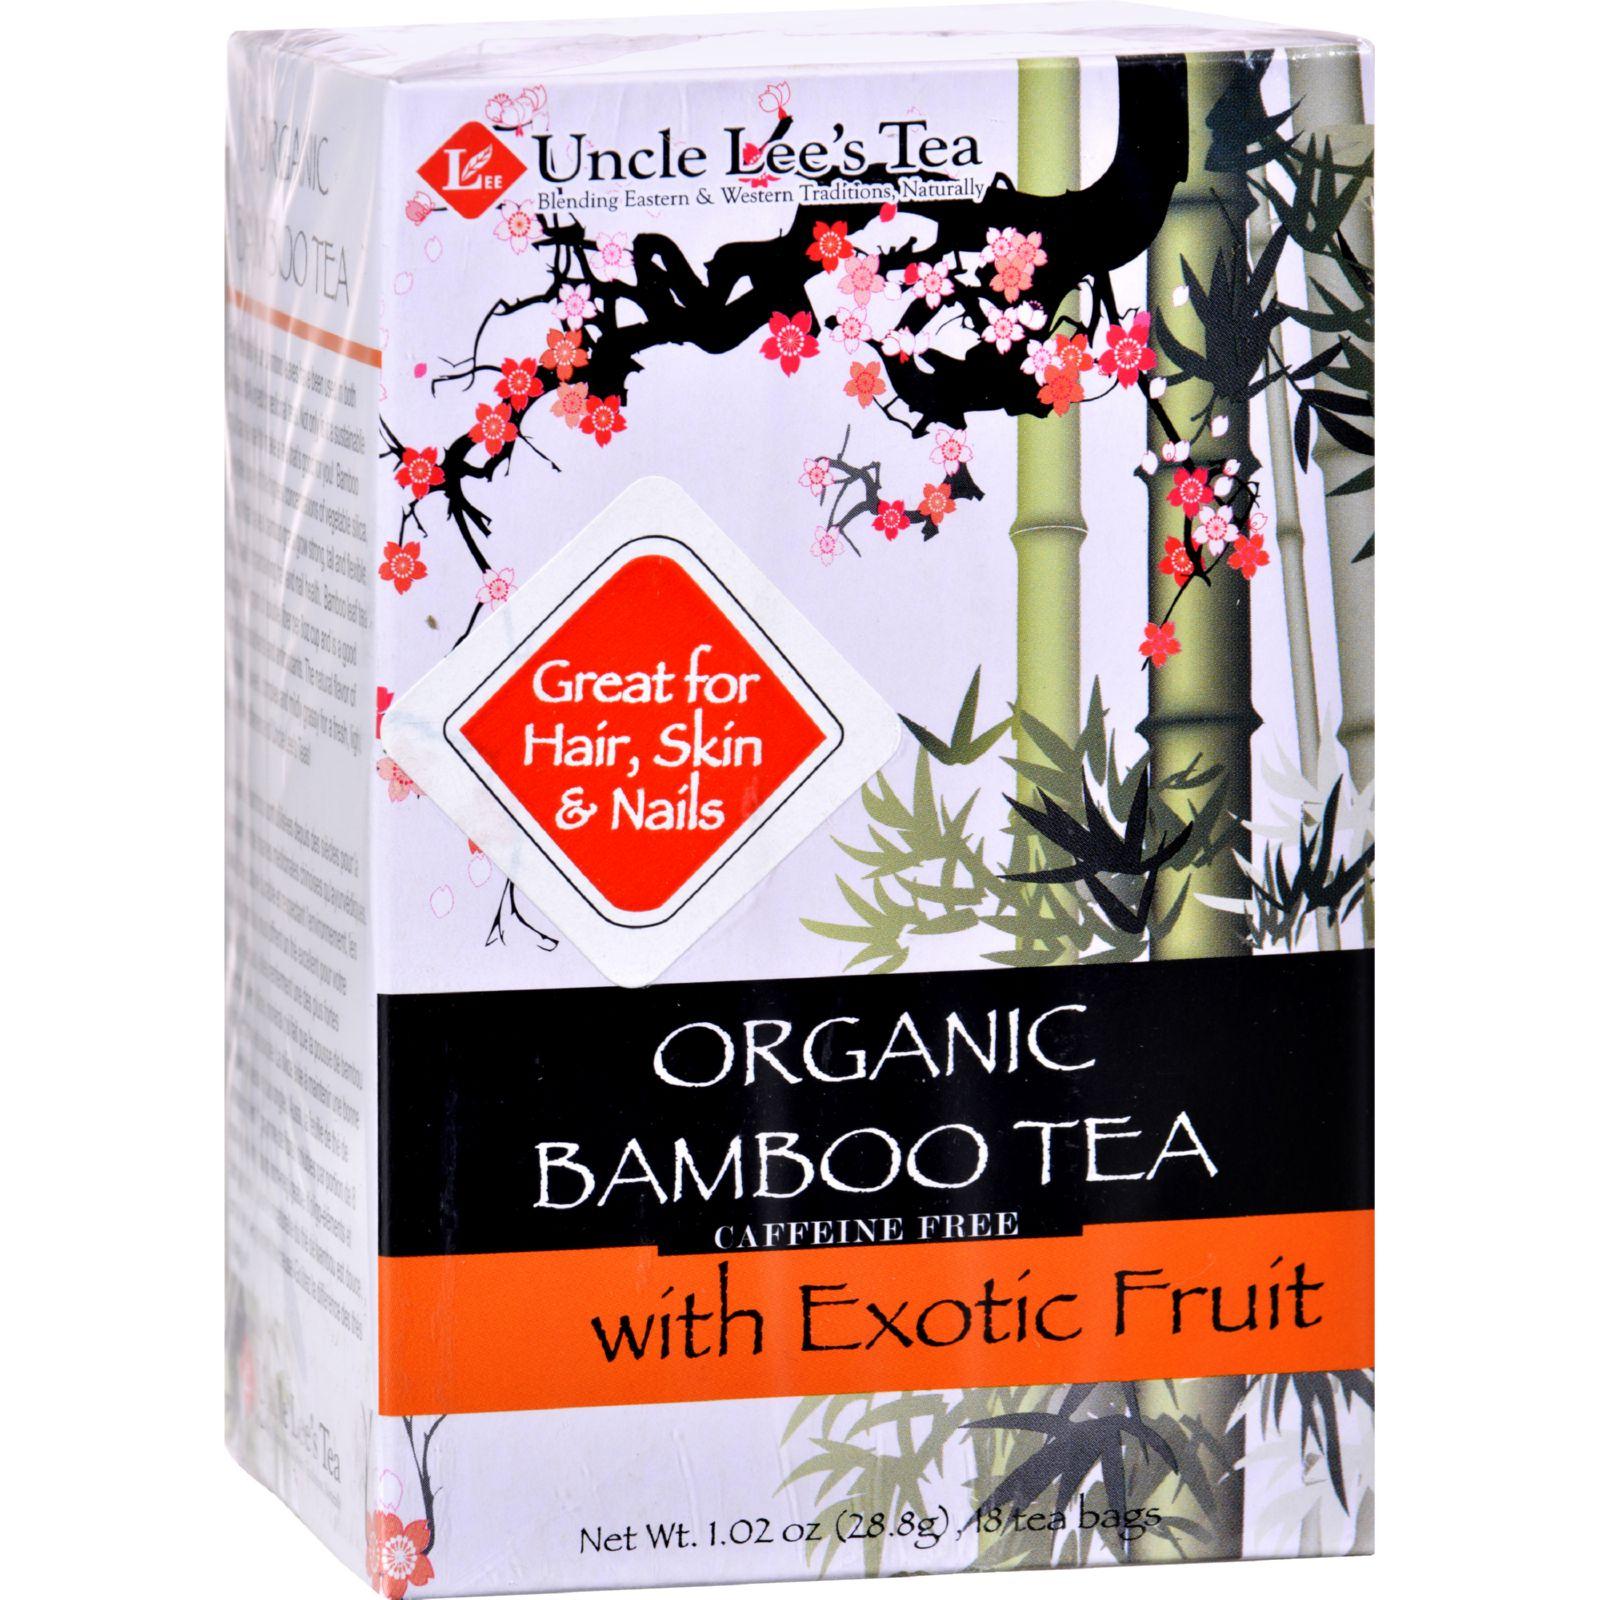 Uncle Lees Tea Organic Tea - Bamboo Exotic Fruit - 18 Bags